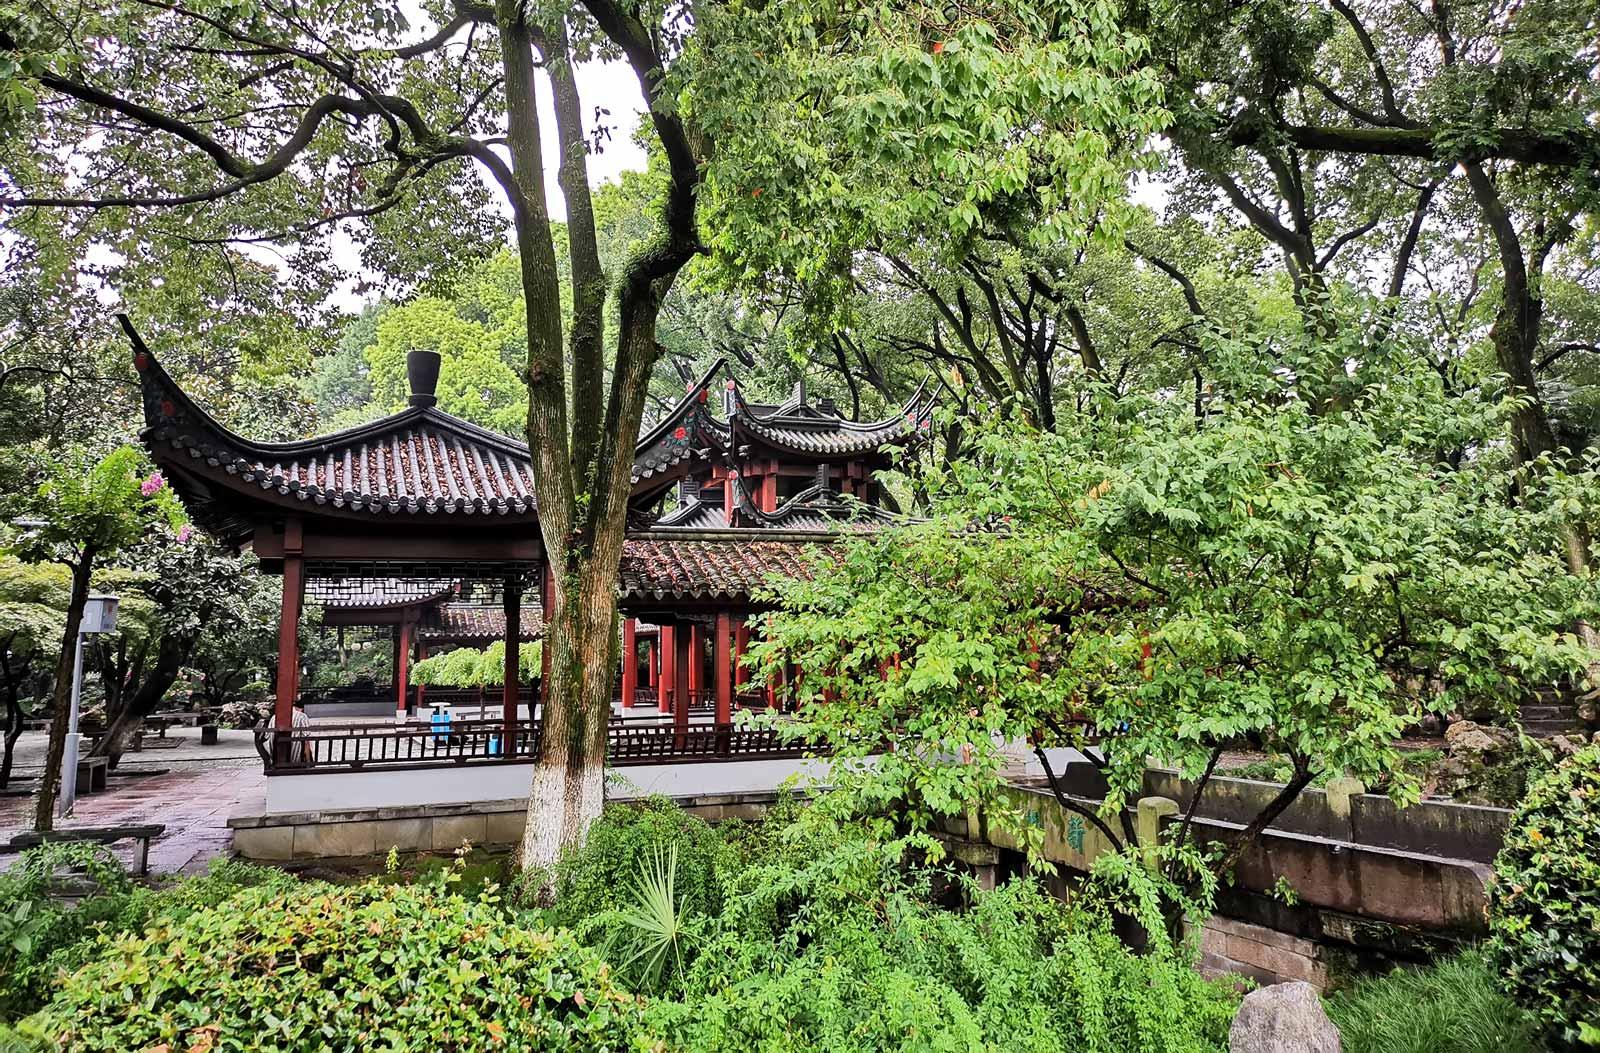 Ningbo Park